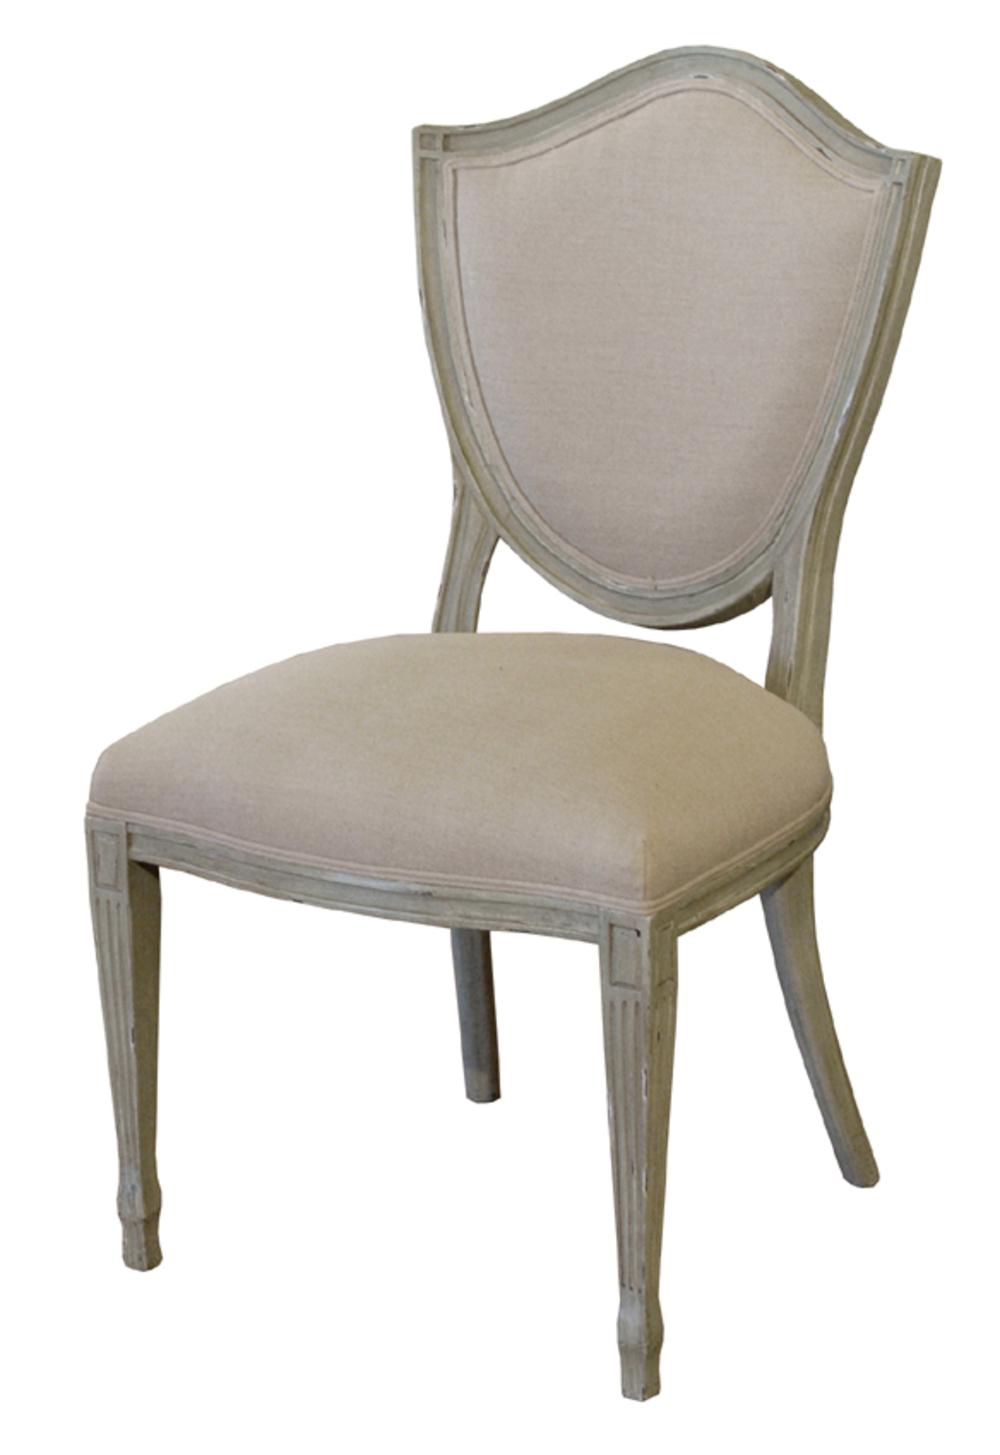 GJ Styles - Nikita Side Chair